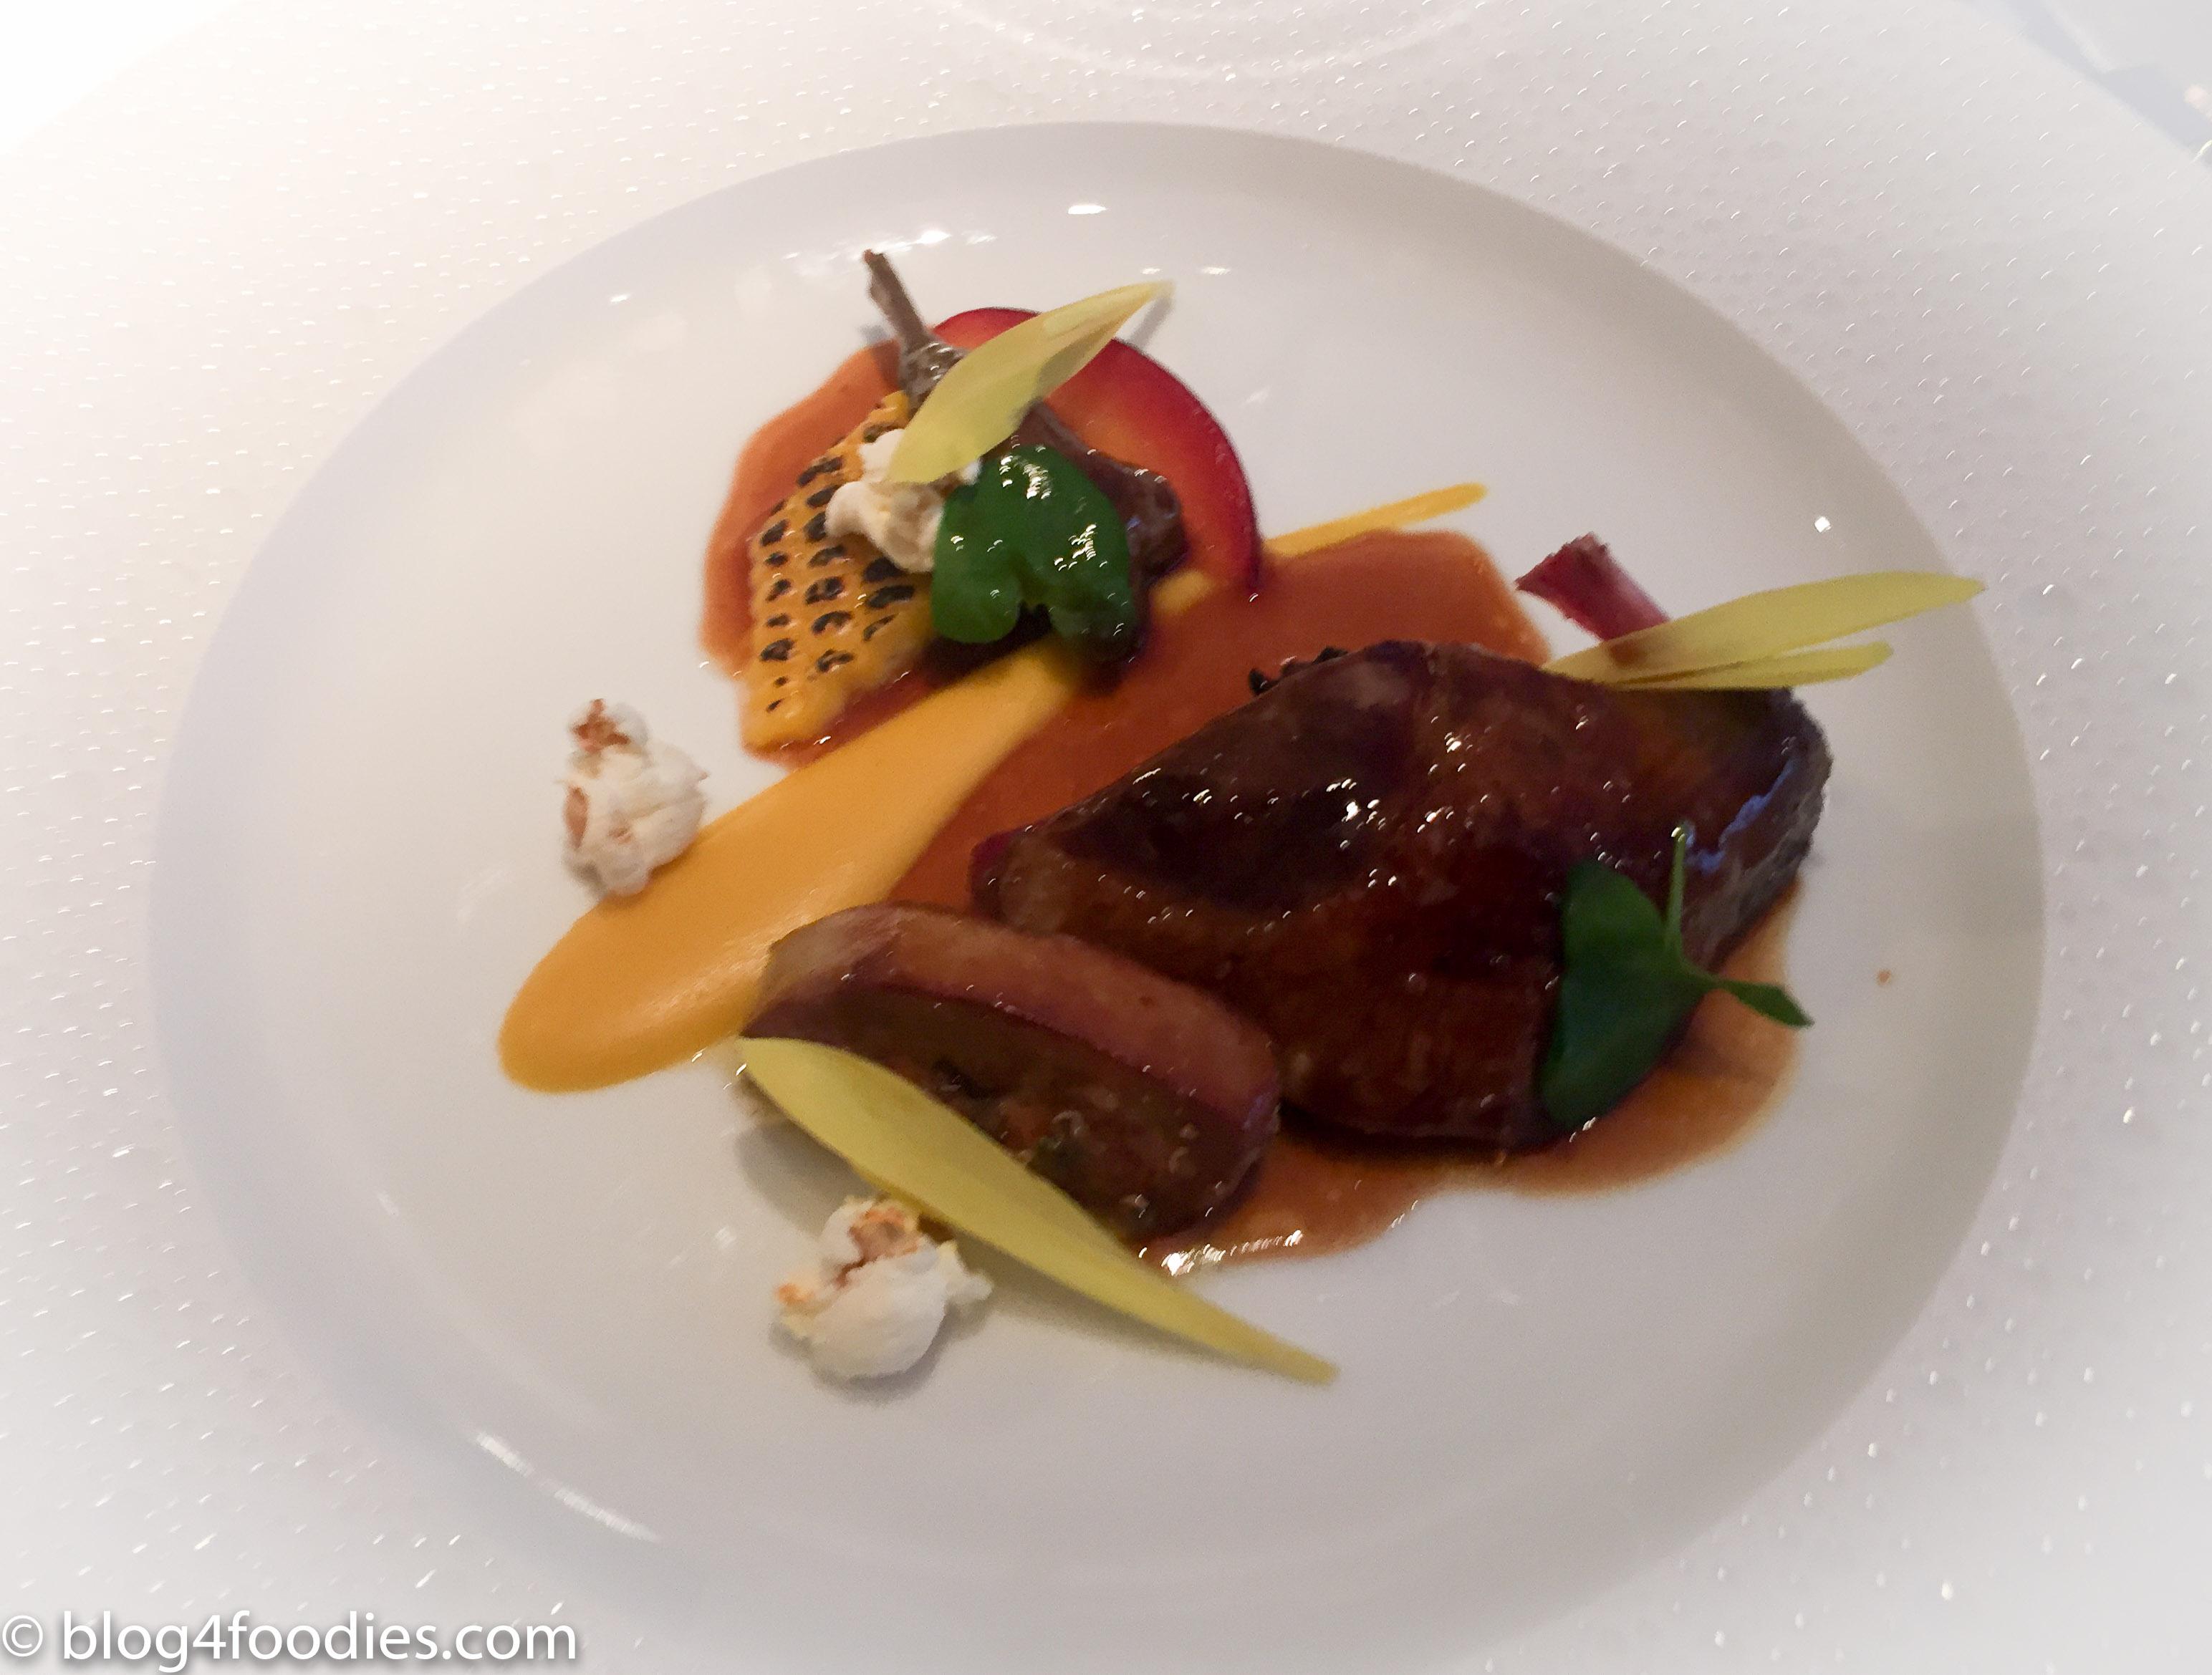 Restaurant gordon ramsay blog4foodies - Gordon ramsay cuisine cool ...